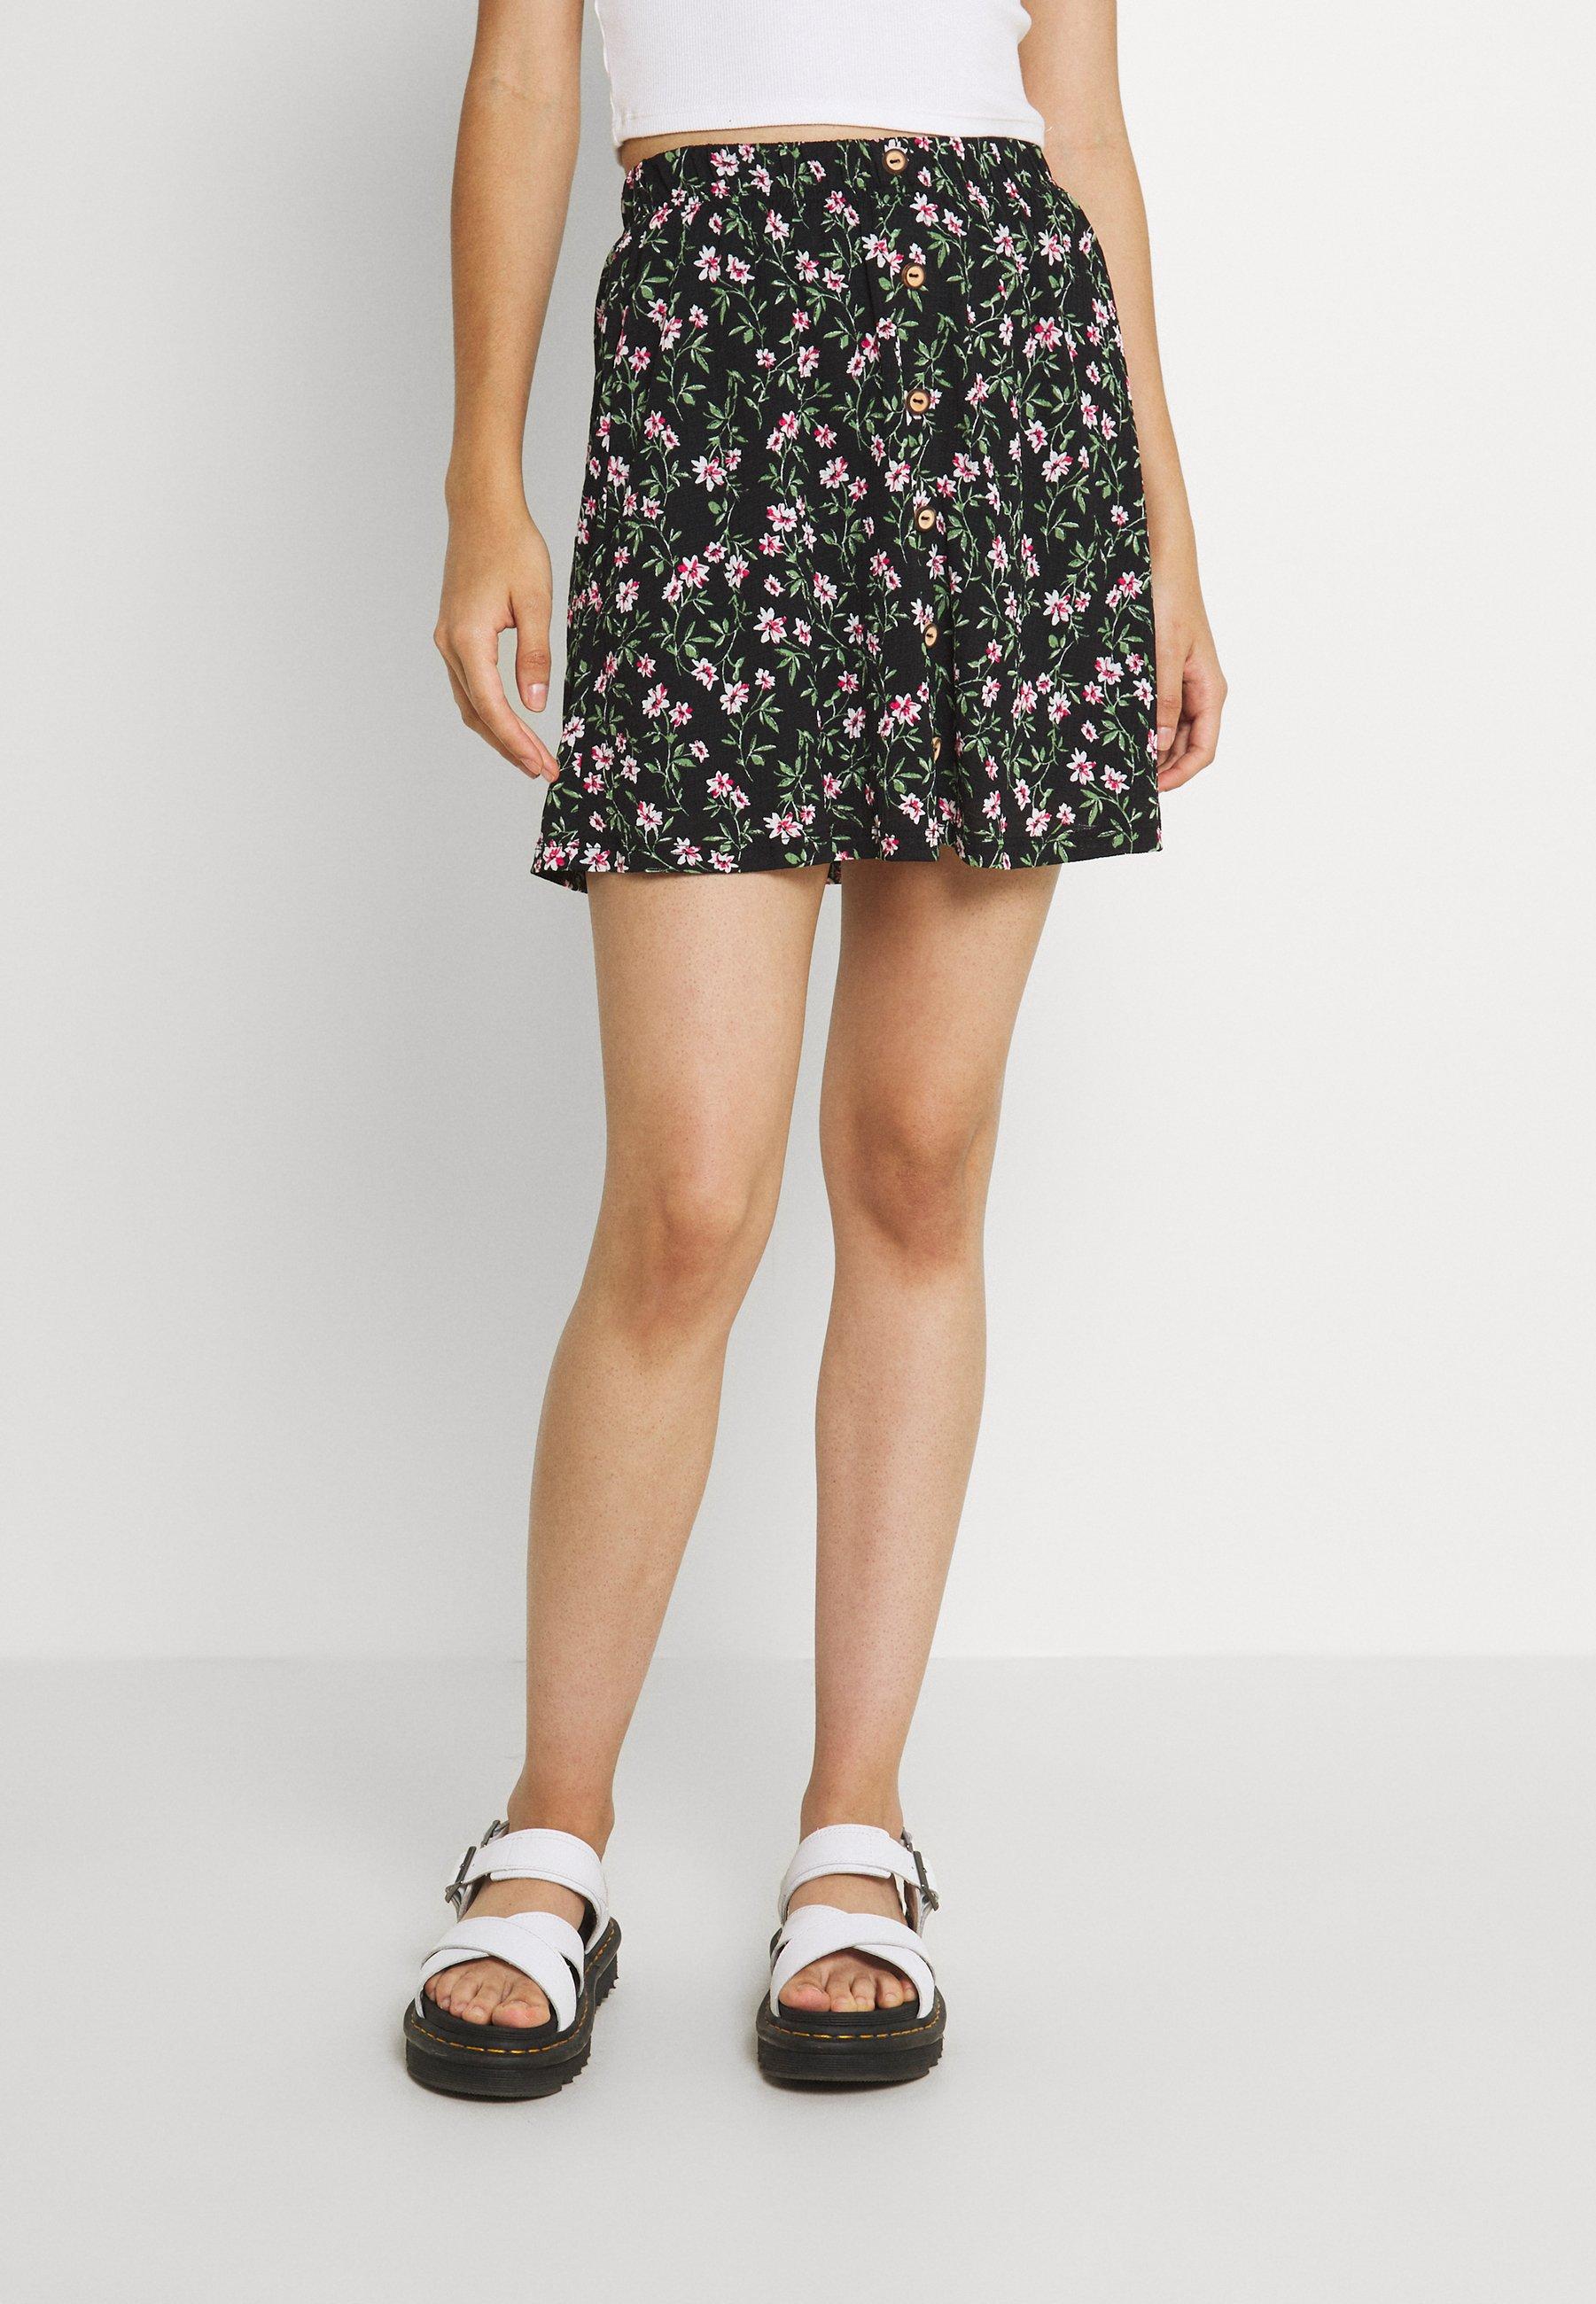 Femme ONLPELLA SHORT SKIRT - Minijupe